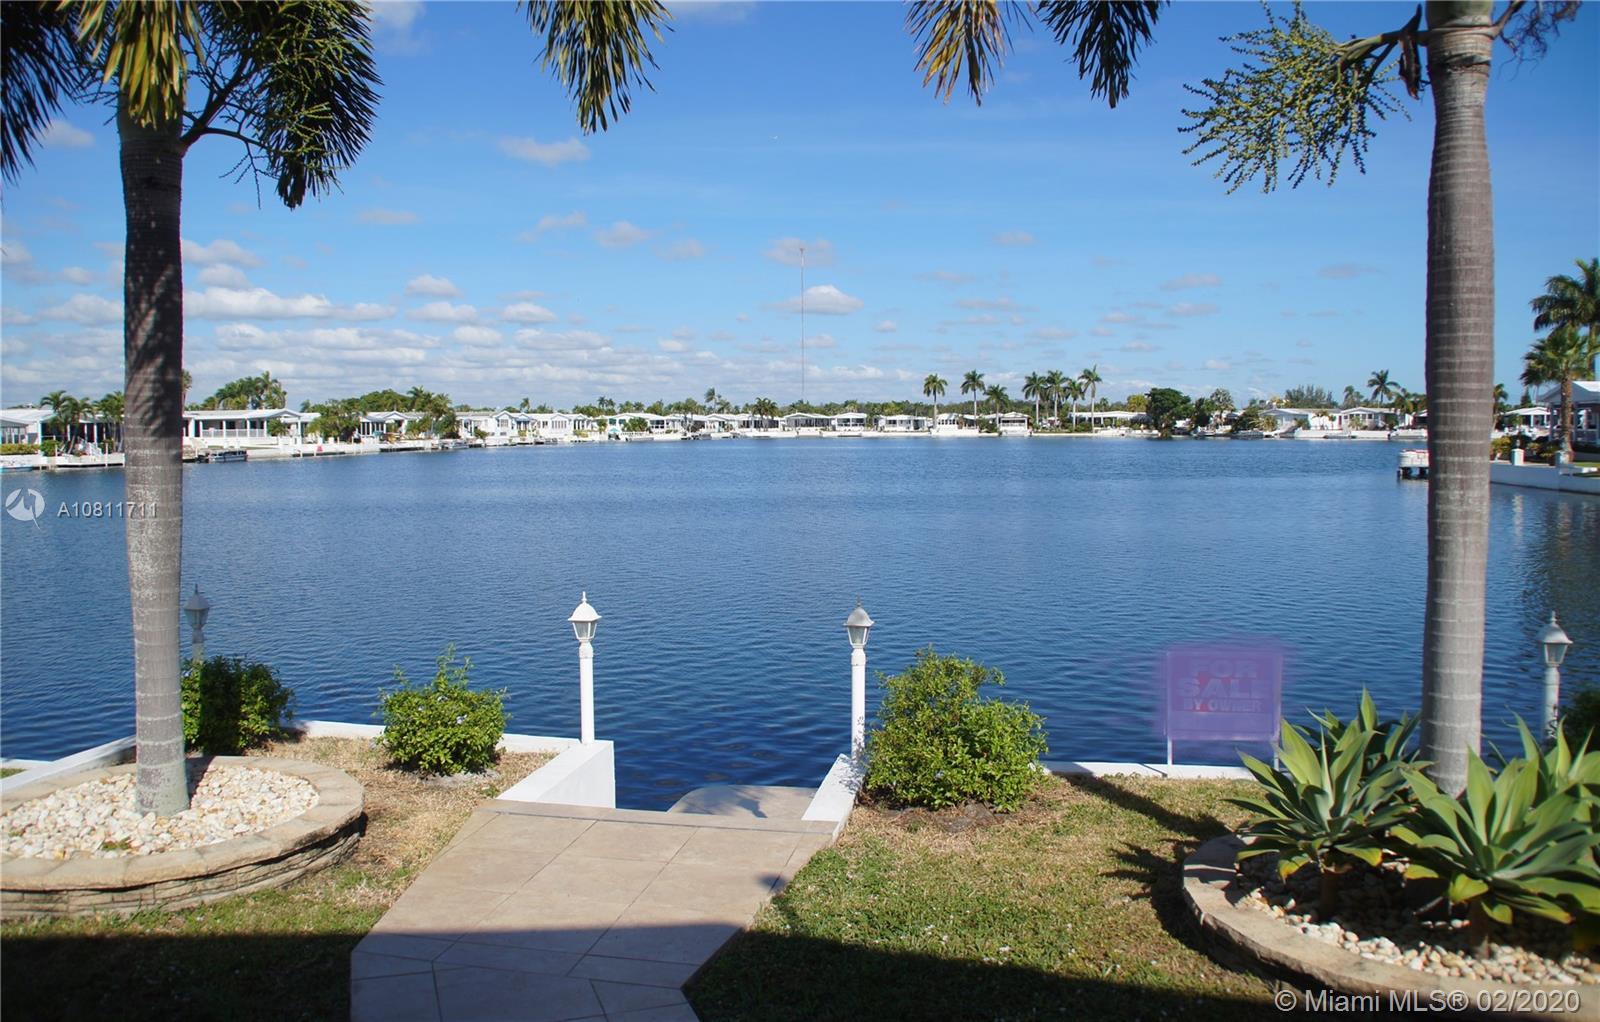 Homes for Sale in Zip Code 33009